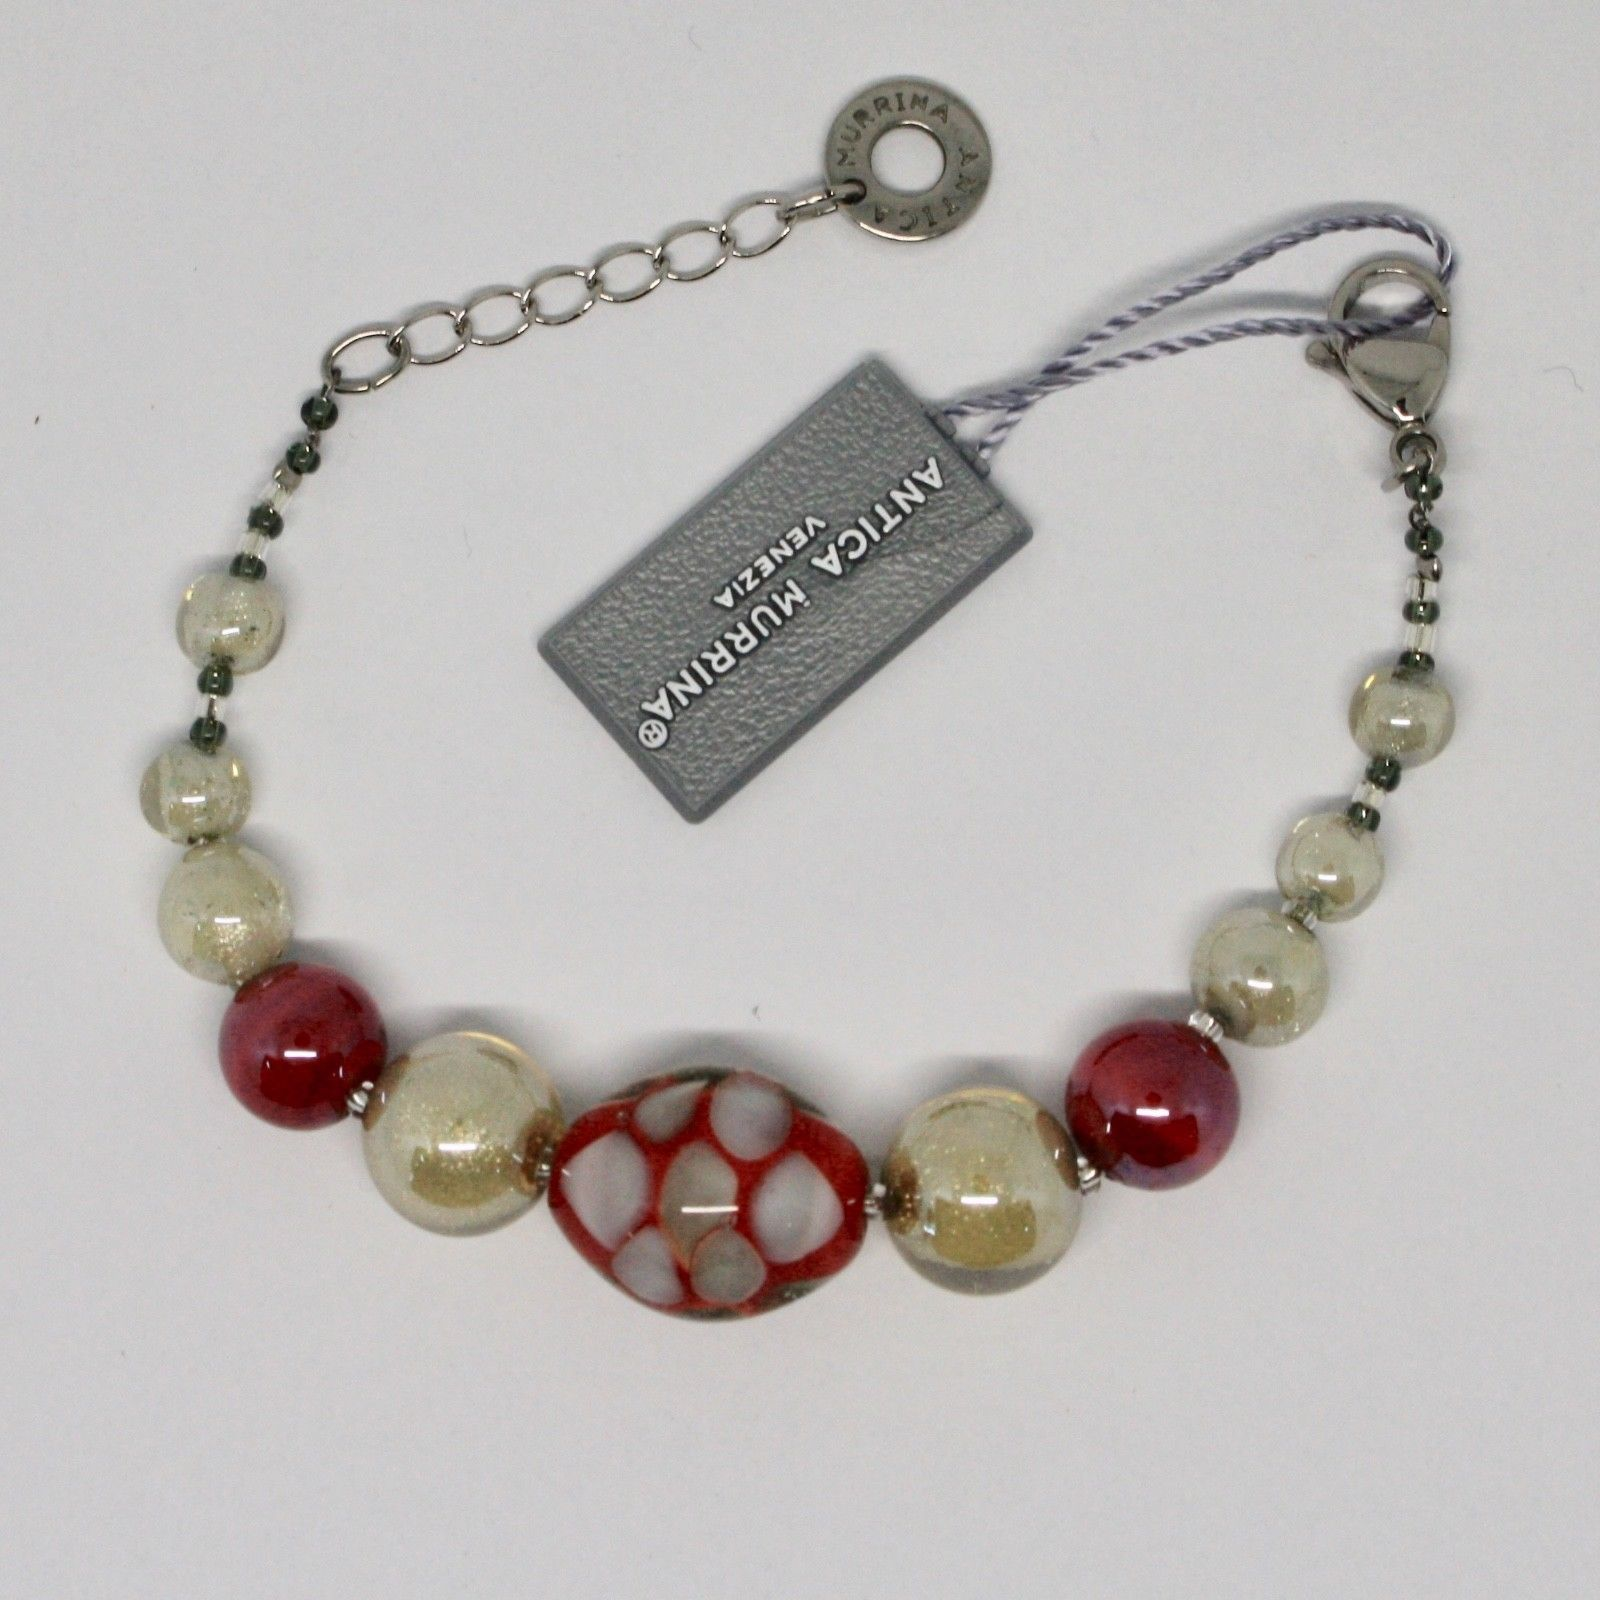 BRACELET ANTICA MURRINA VENEZIA WITH MURANO GLASS RED BEIGE CREAM BR745A31